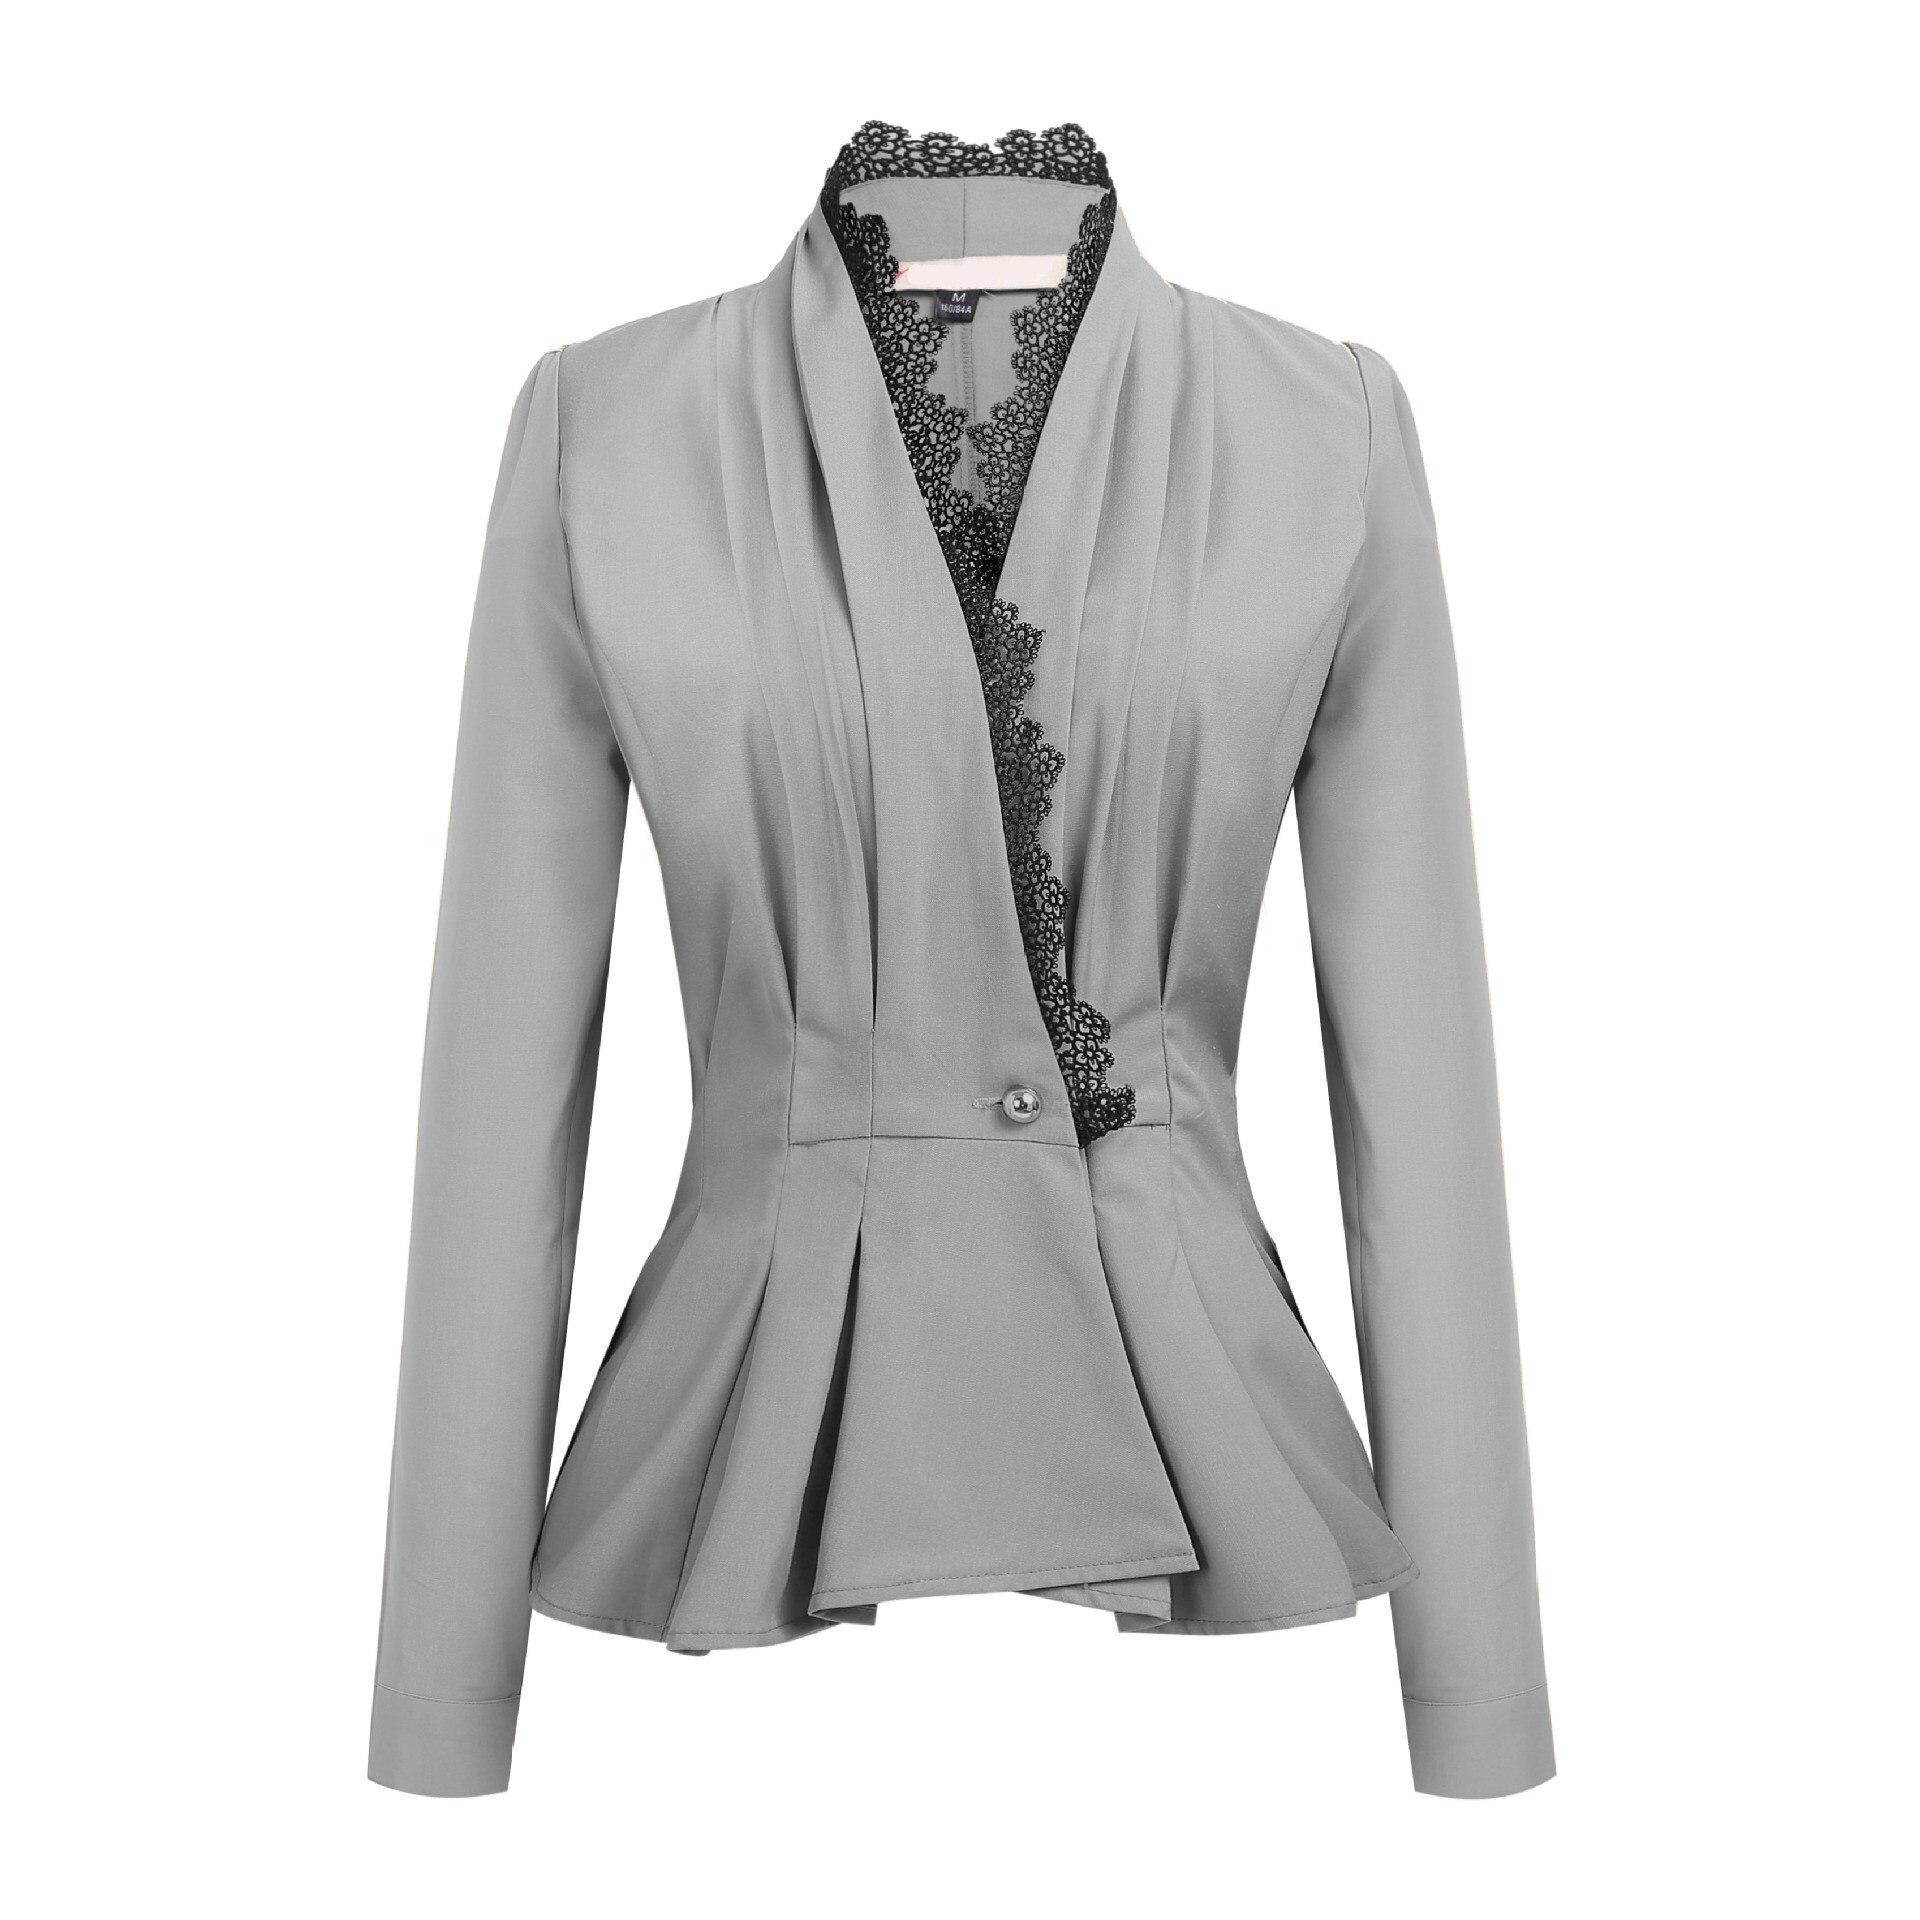 2019 Fashion Lace Blazers Jackets Women Work Office Lady Suit Solid Black Single Button Business Female Slim Blazer